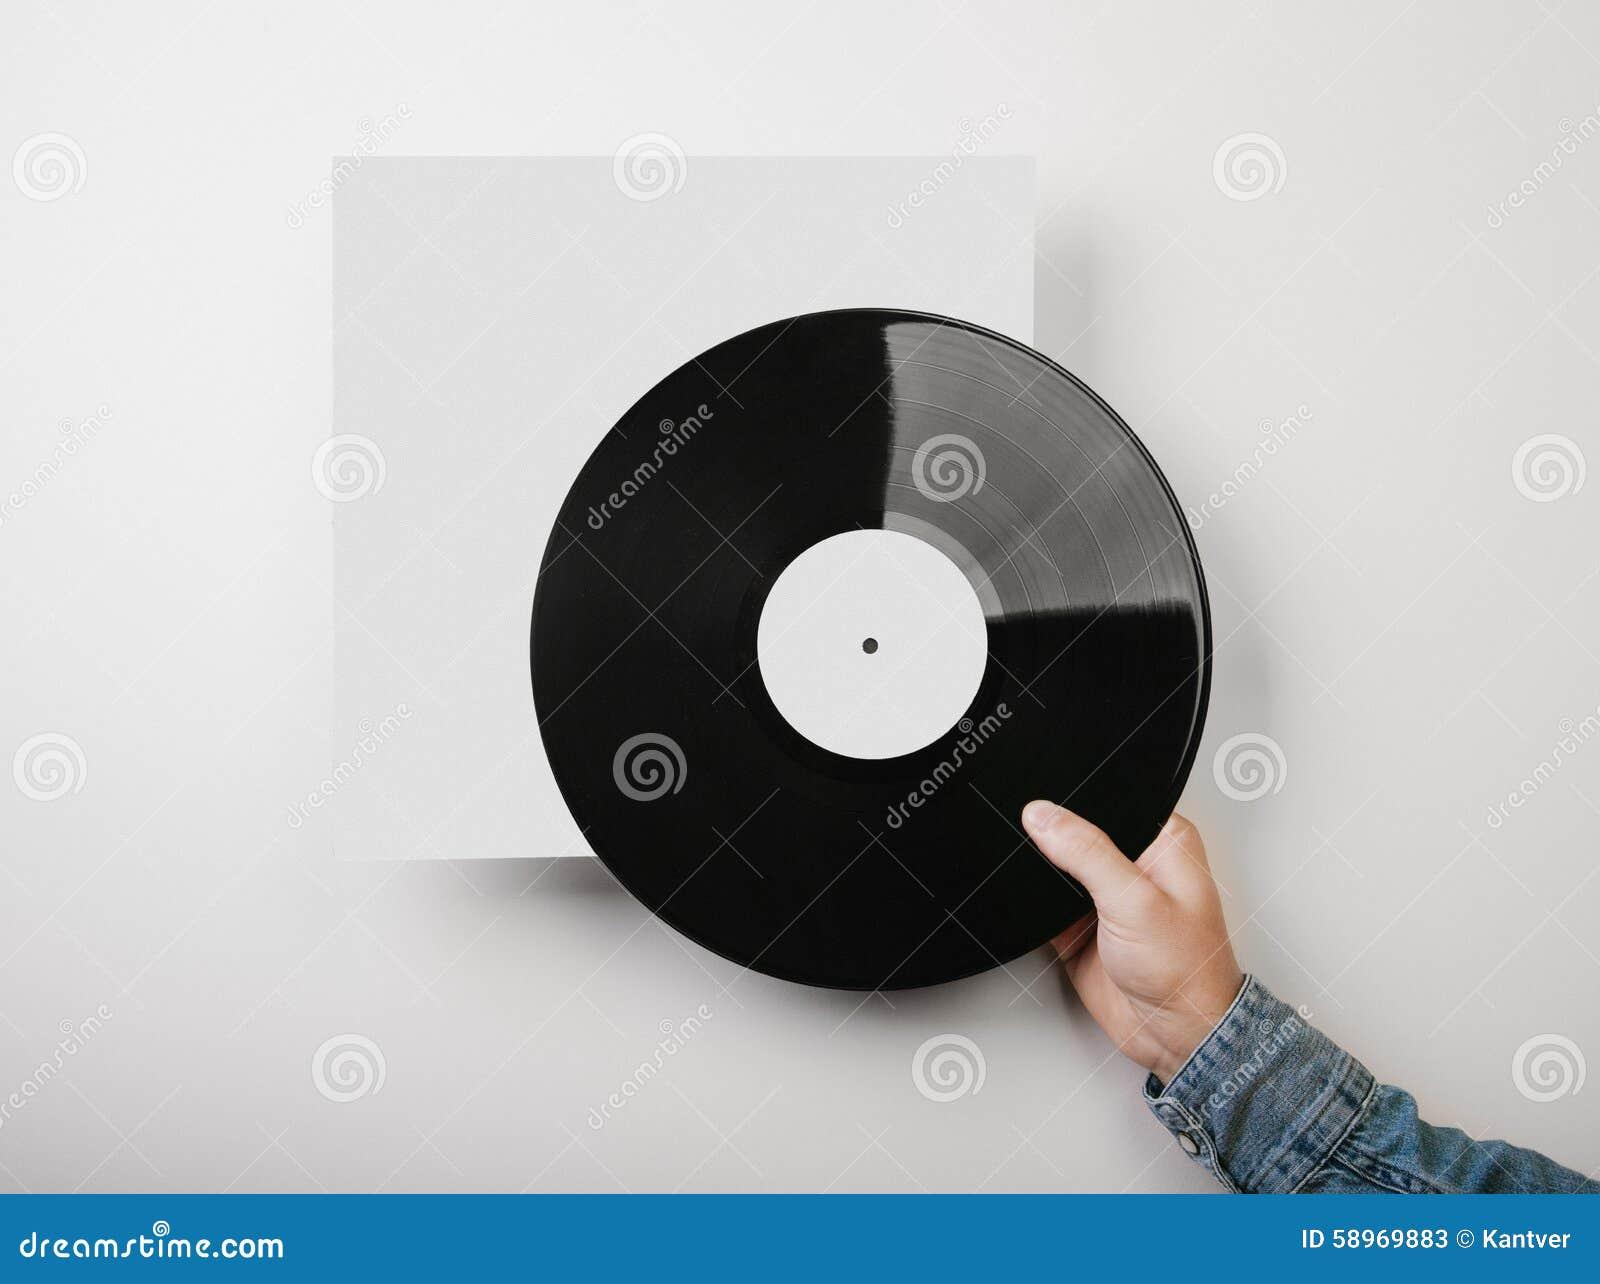 Male hand holding vinyl music album template on